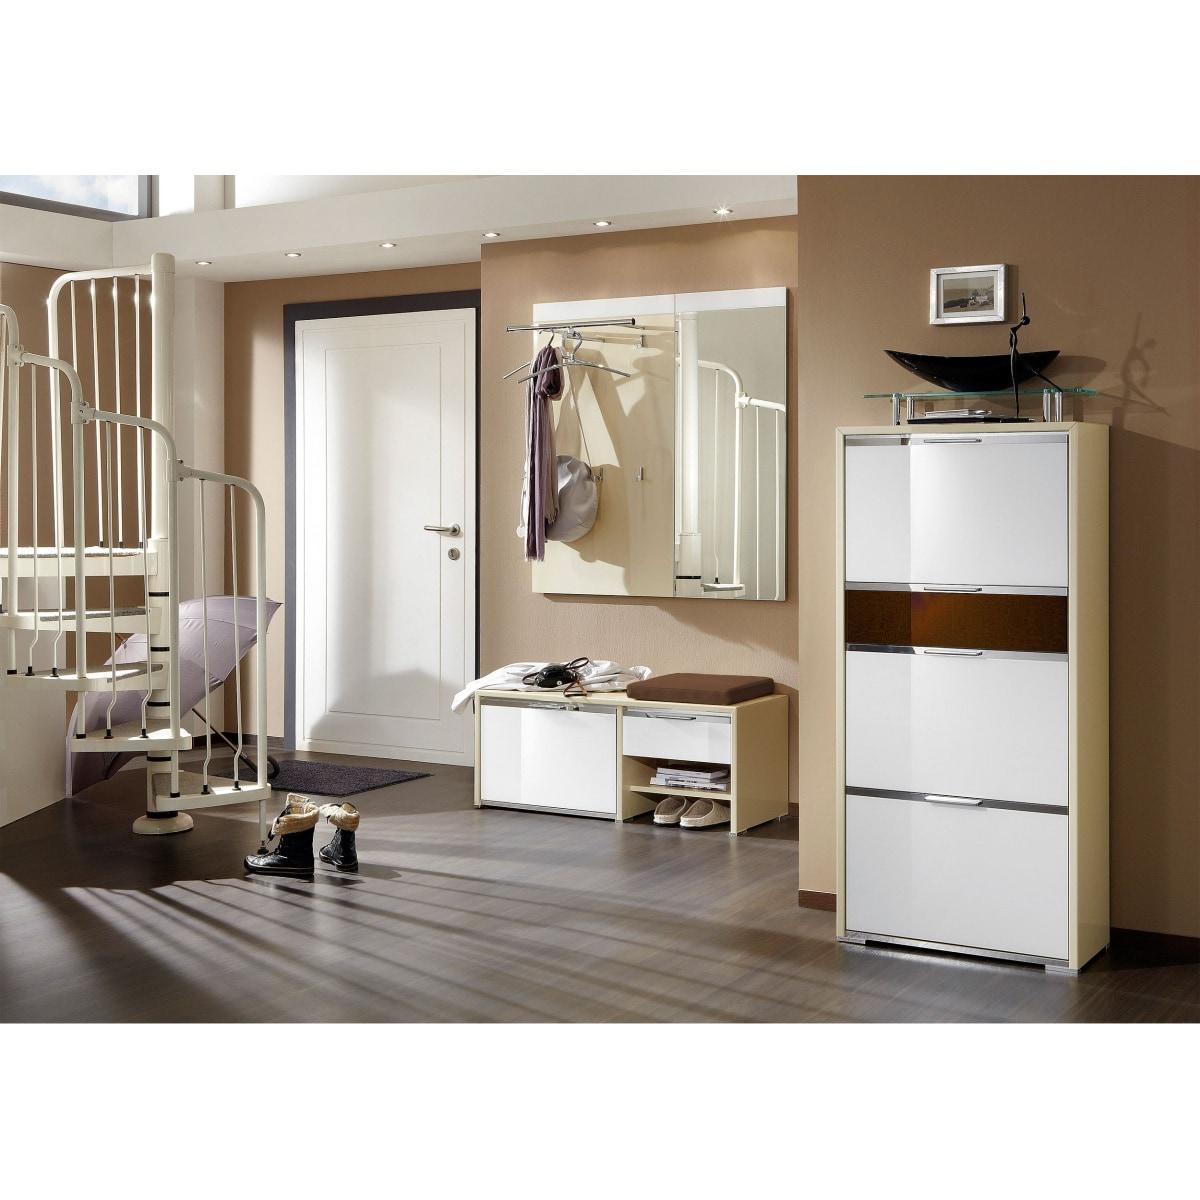 medor schuhschrank icki bardolino eiche ca 80 x 200 x 34. Black Bedroom Furniture Sets. Home Design Ideas